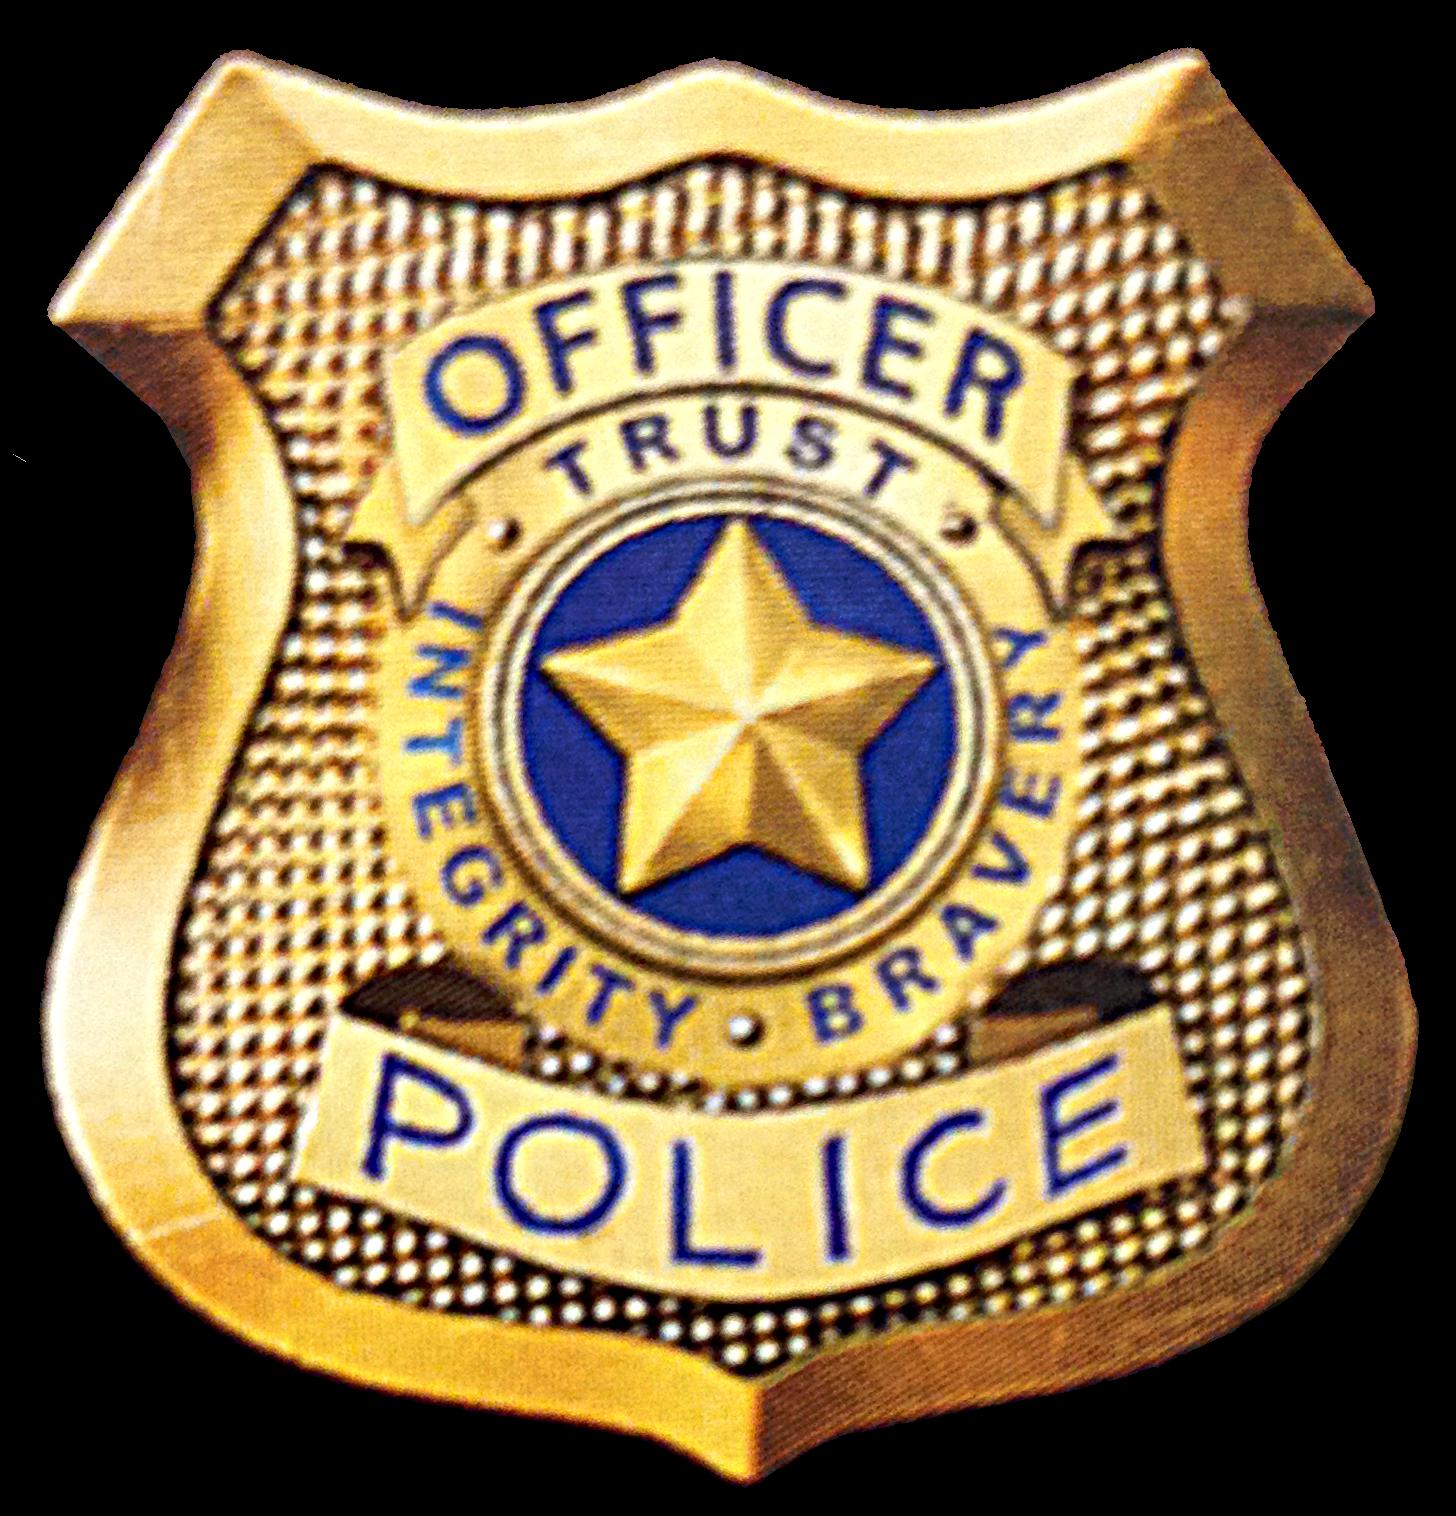 Eagle clipart police, Eagle police Transparent FREE for